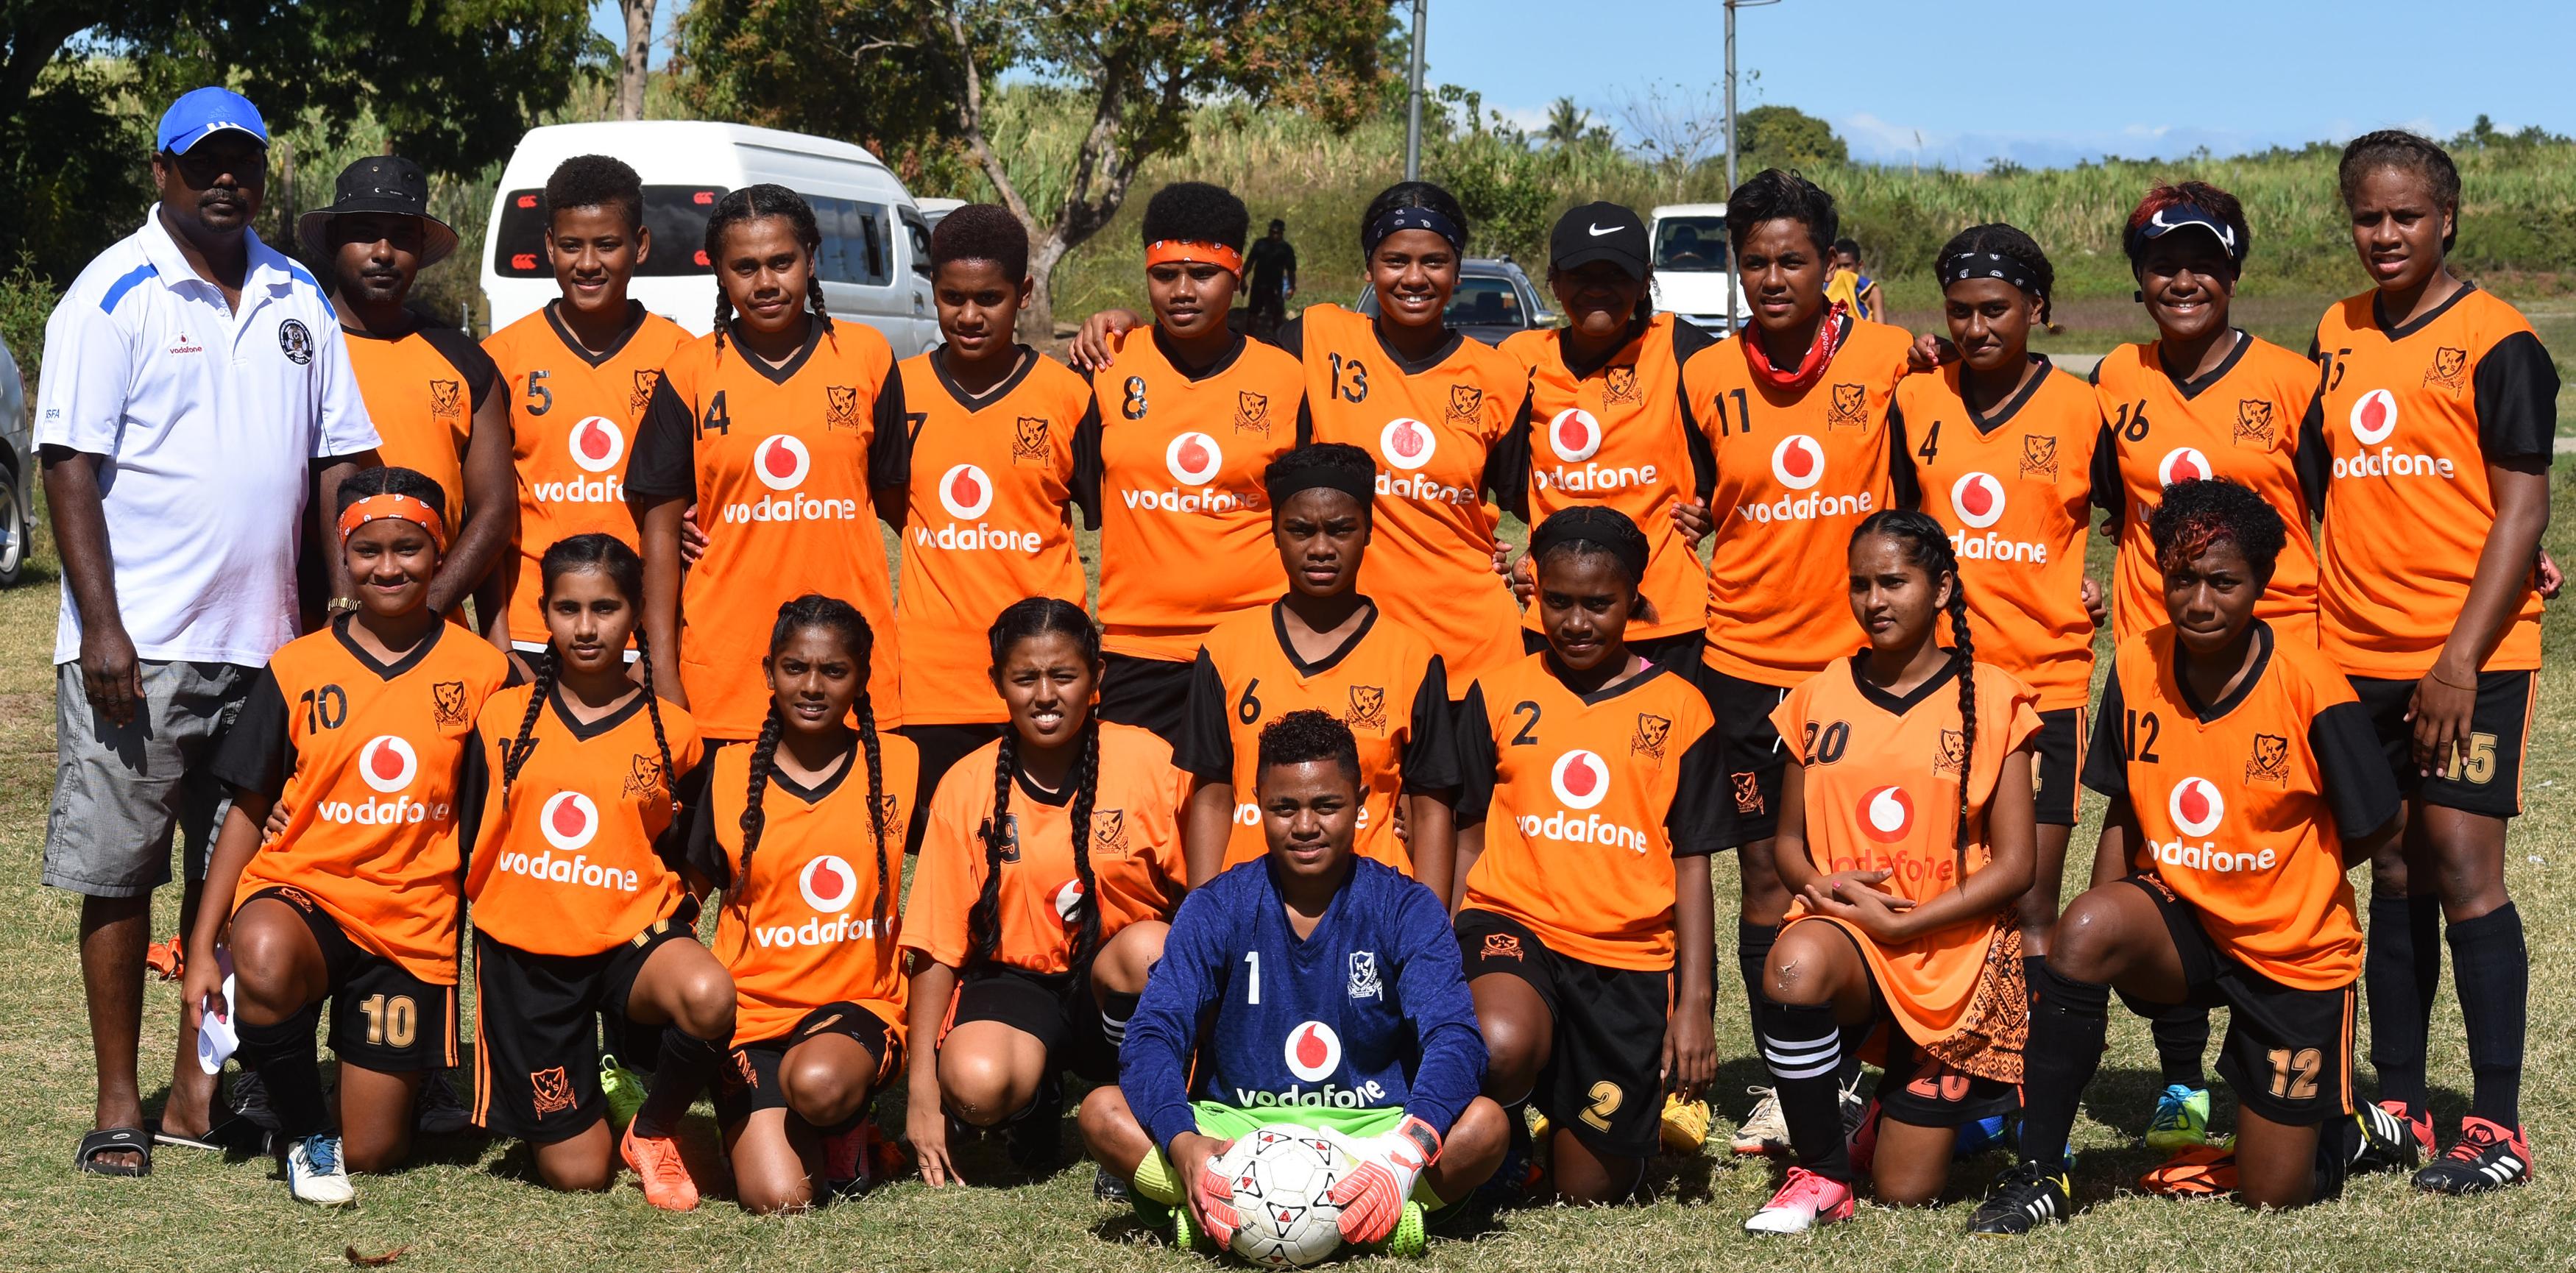 Vunimomo High School open girls team at Korovuto College ground in Nadi on August 12, 2018. Photo: Waisea Nasokia